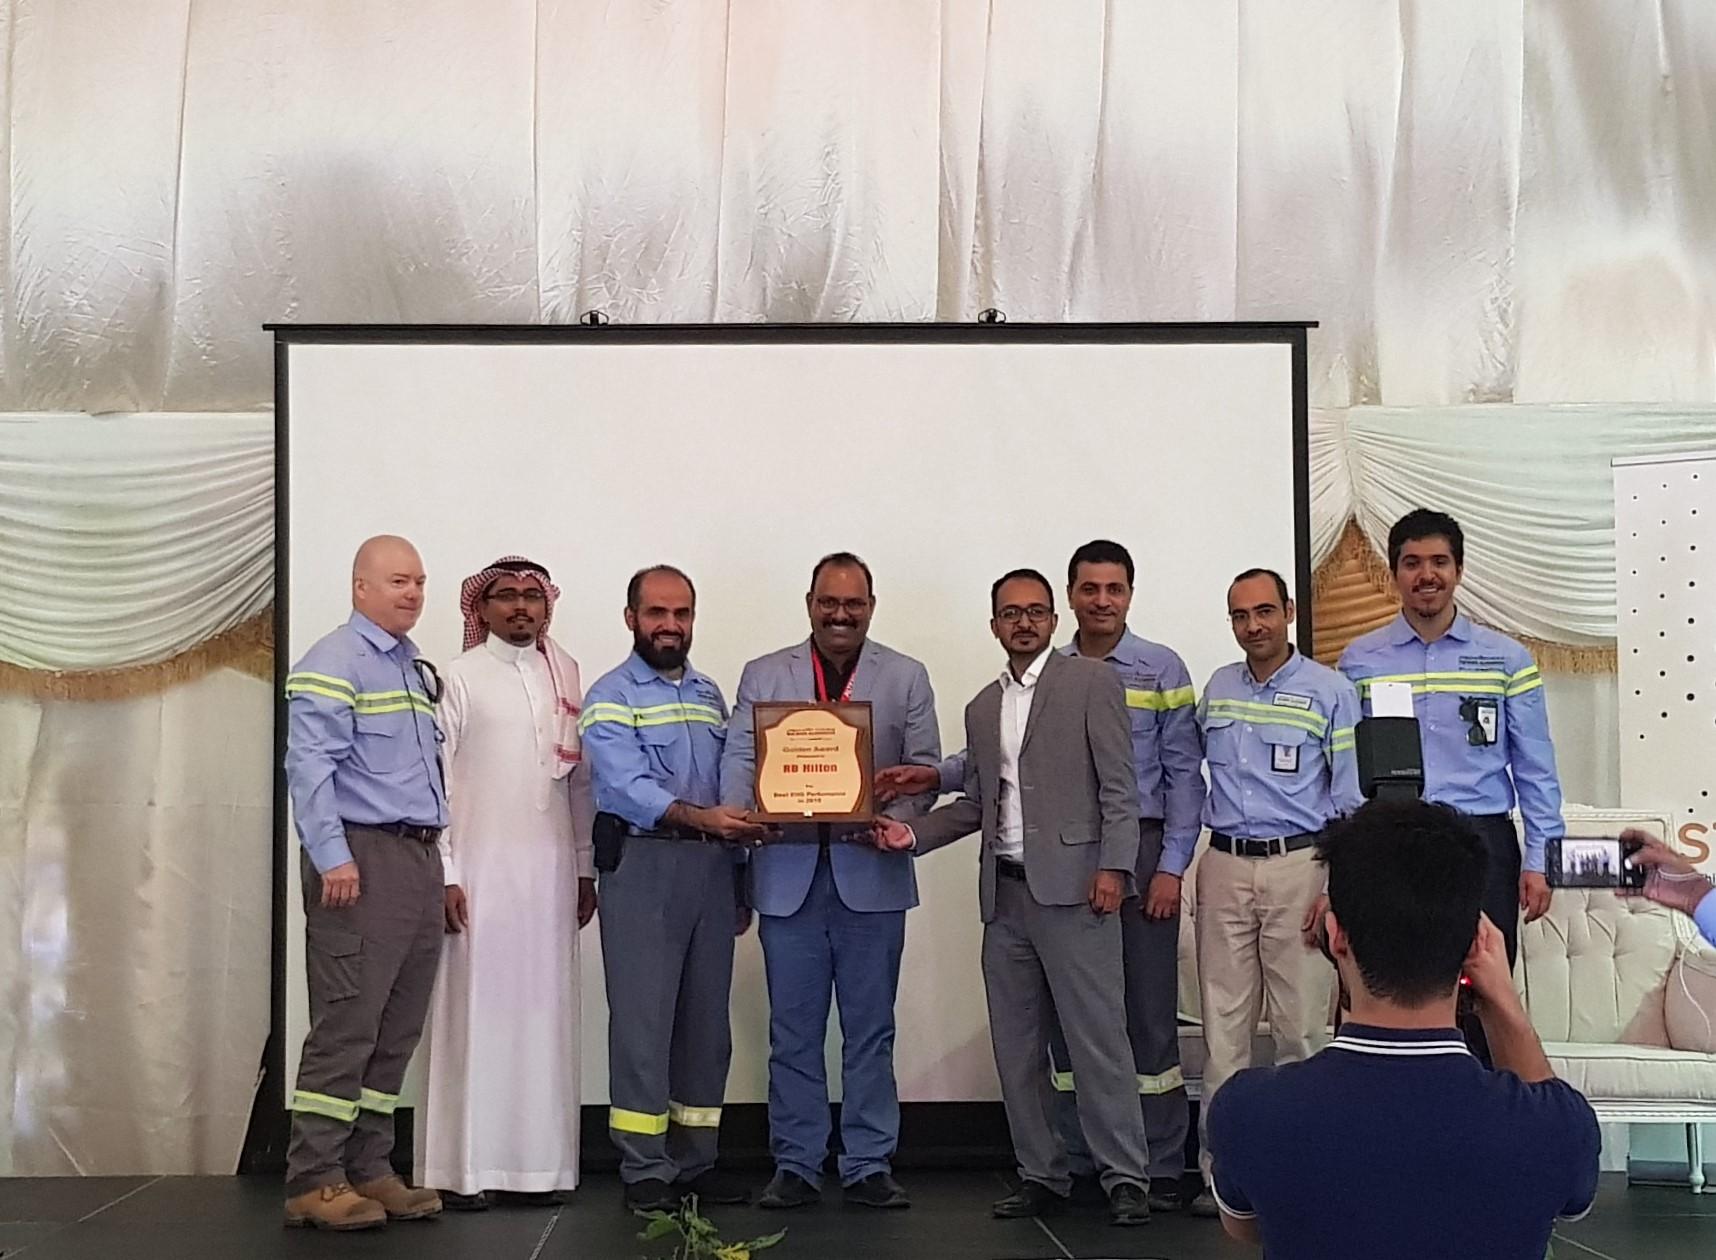 Altrad - R B  Hilton Received the Golden Award - Altrad Group